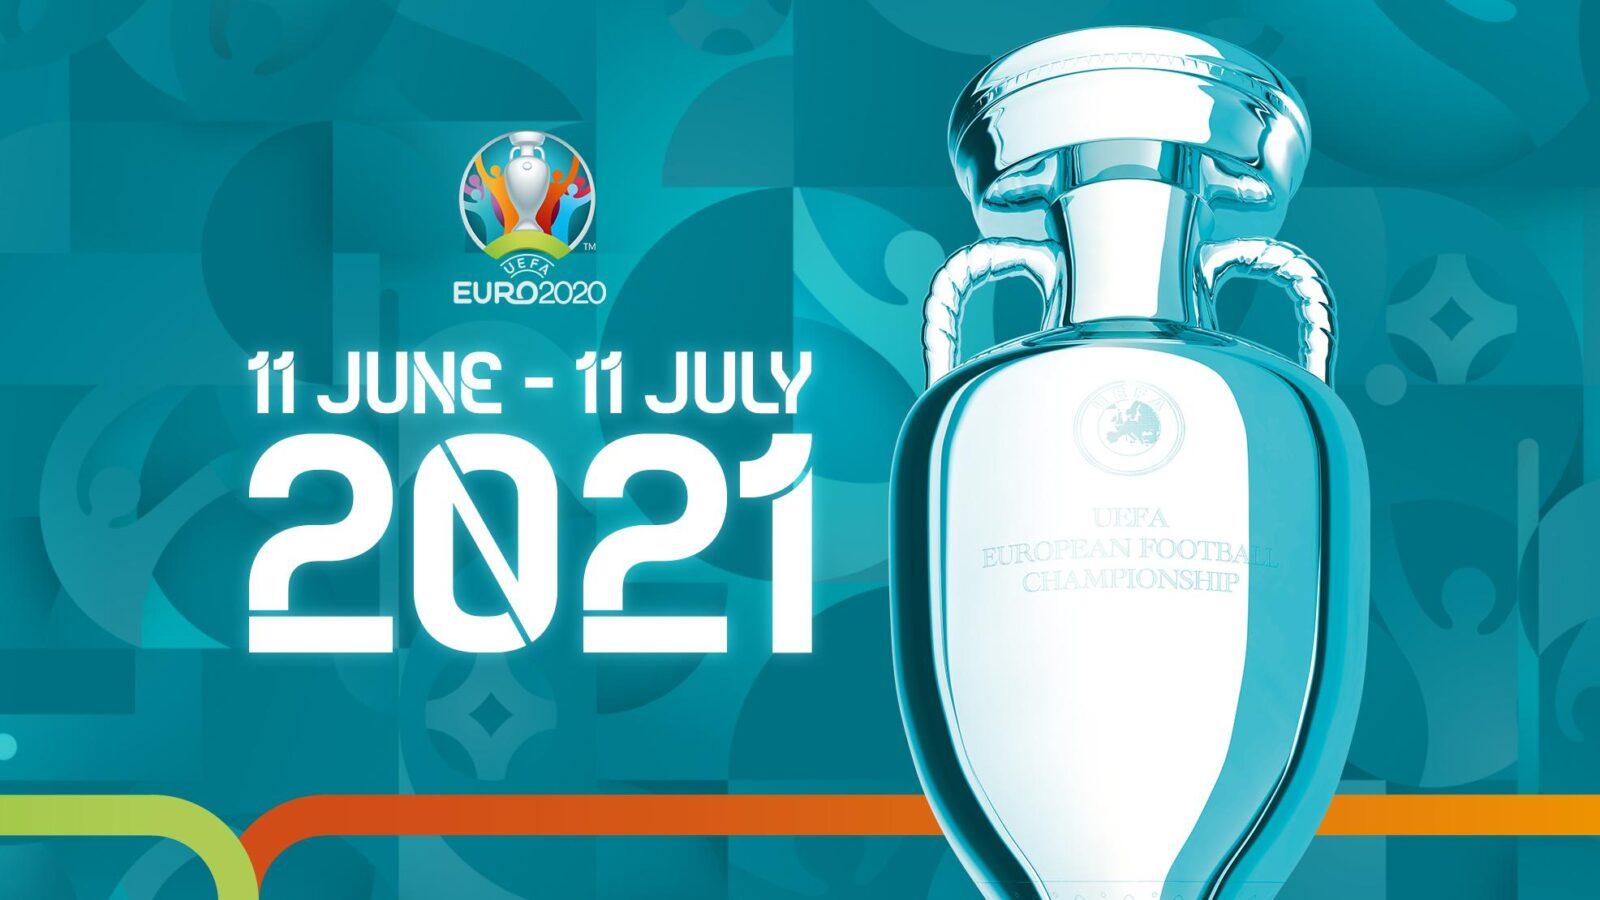 euro-2021-importer-match-calendrier-google-agenda